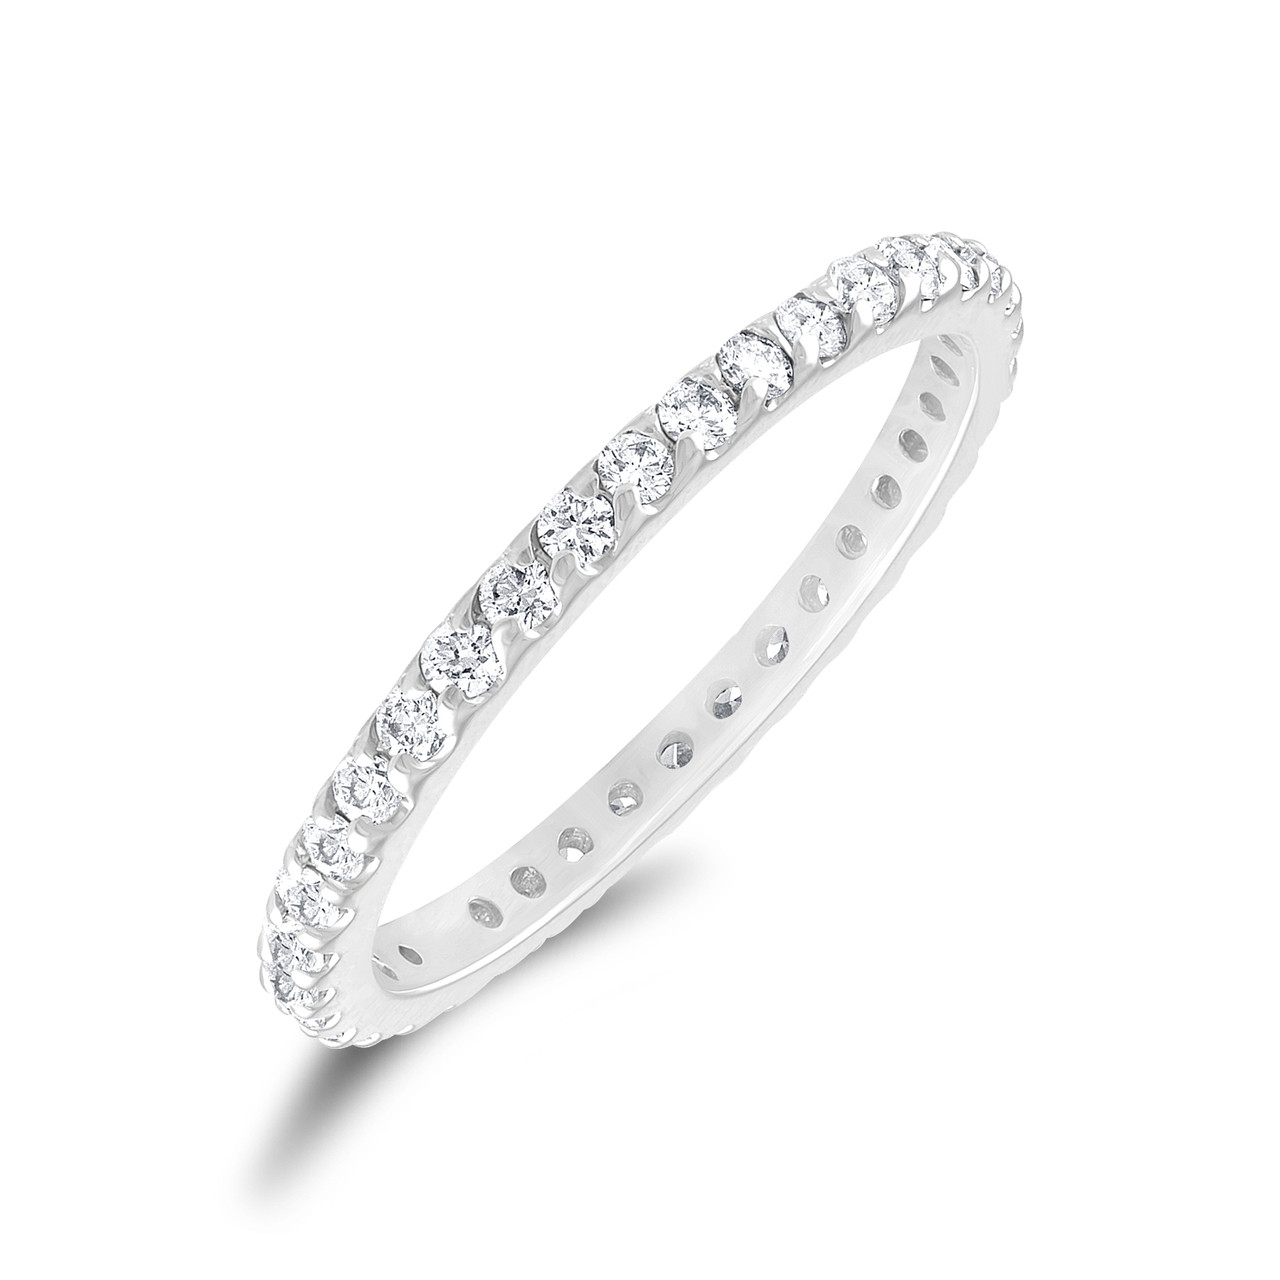 Handcrafted In The Usa: Gar Diamond Wedding Rings Women At Websimilar.org